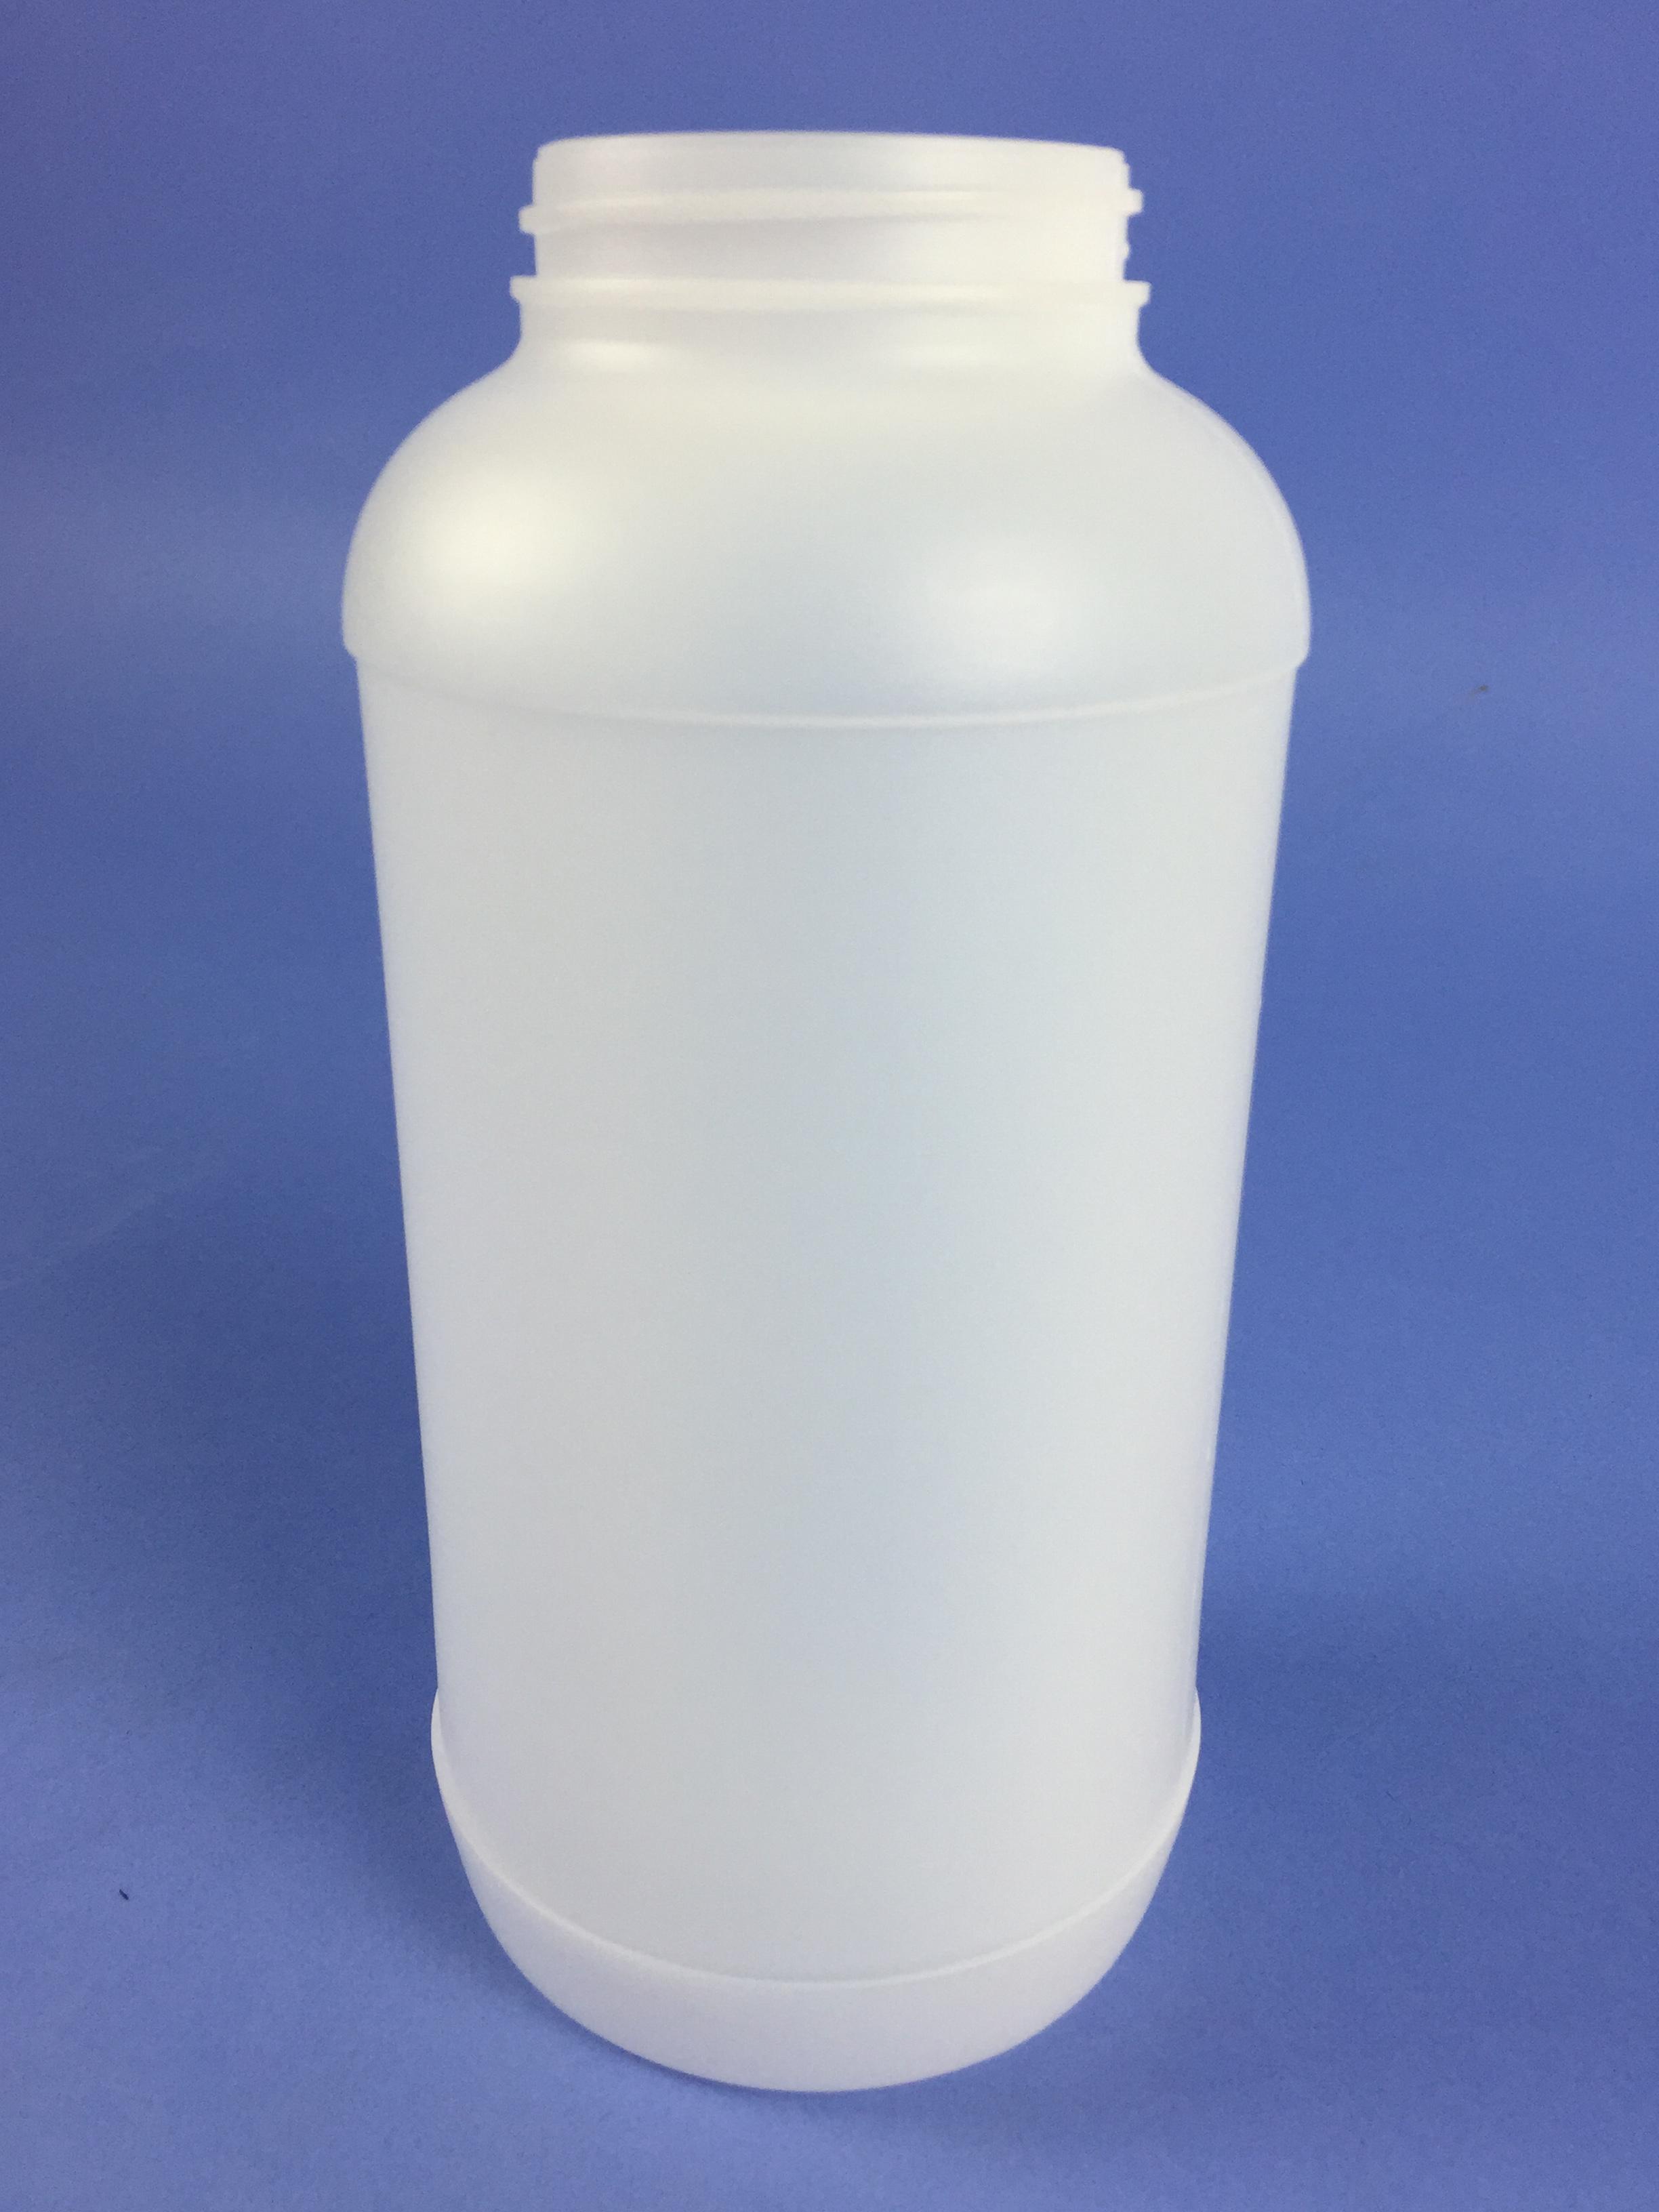 Plastic Bottle Hdpe 1000ml Wide Neck Wn10 Bristol